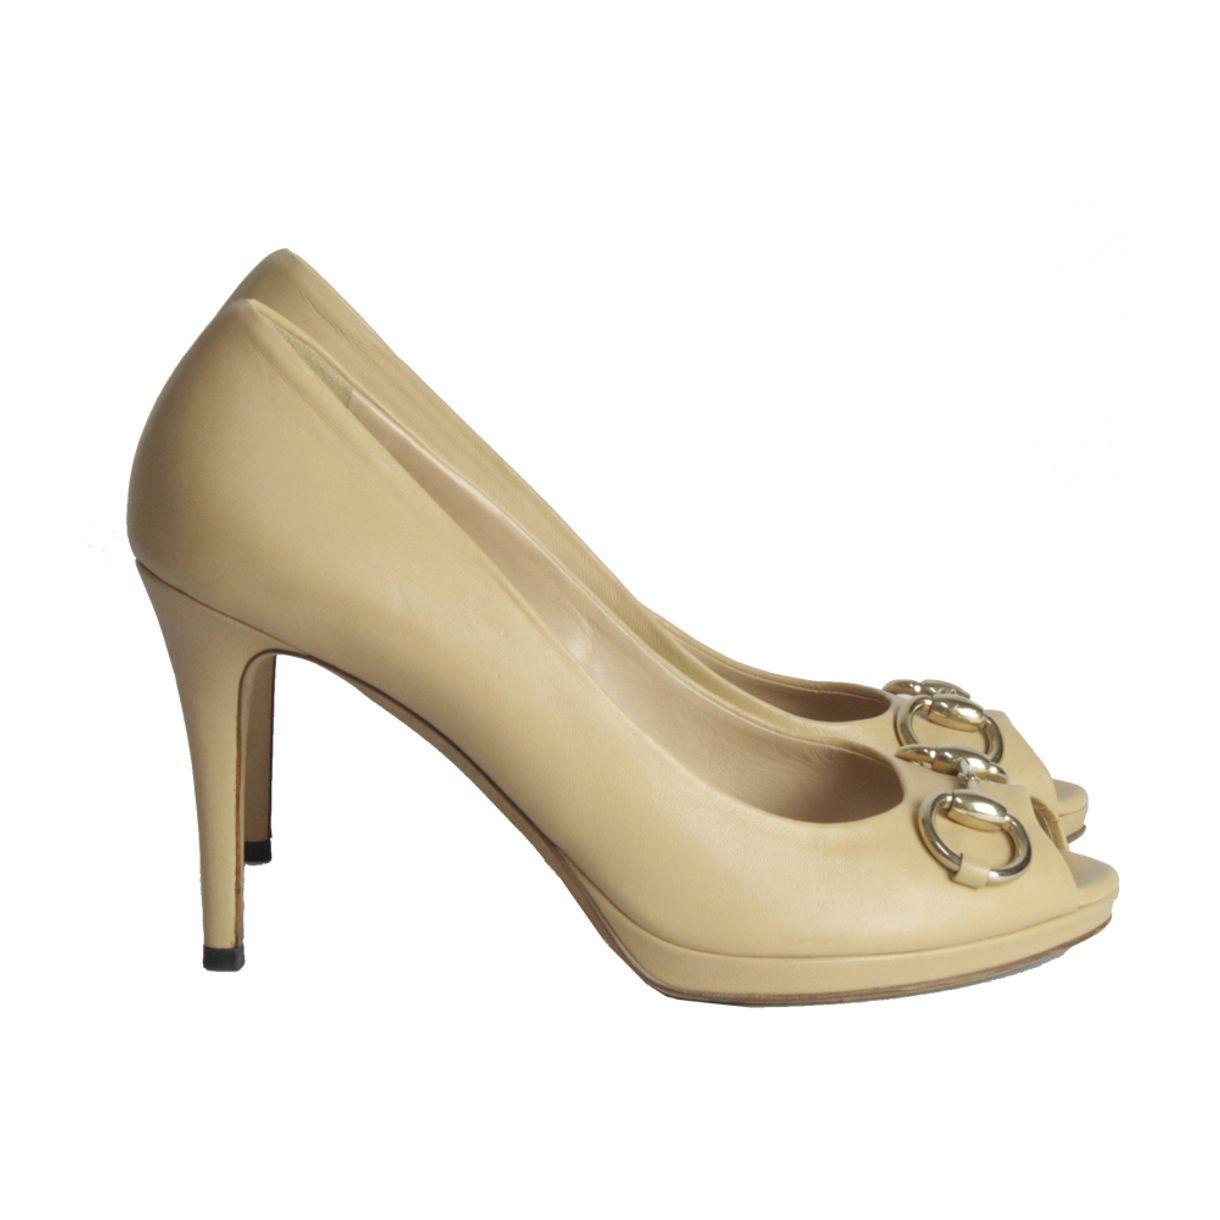 Sapato-de-Salto-Baixo-Gucci-Nude